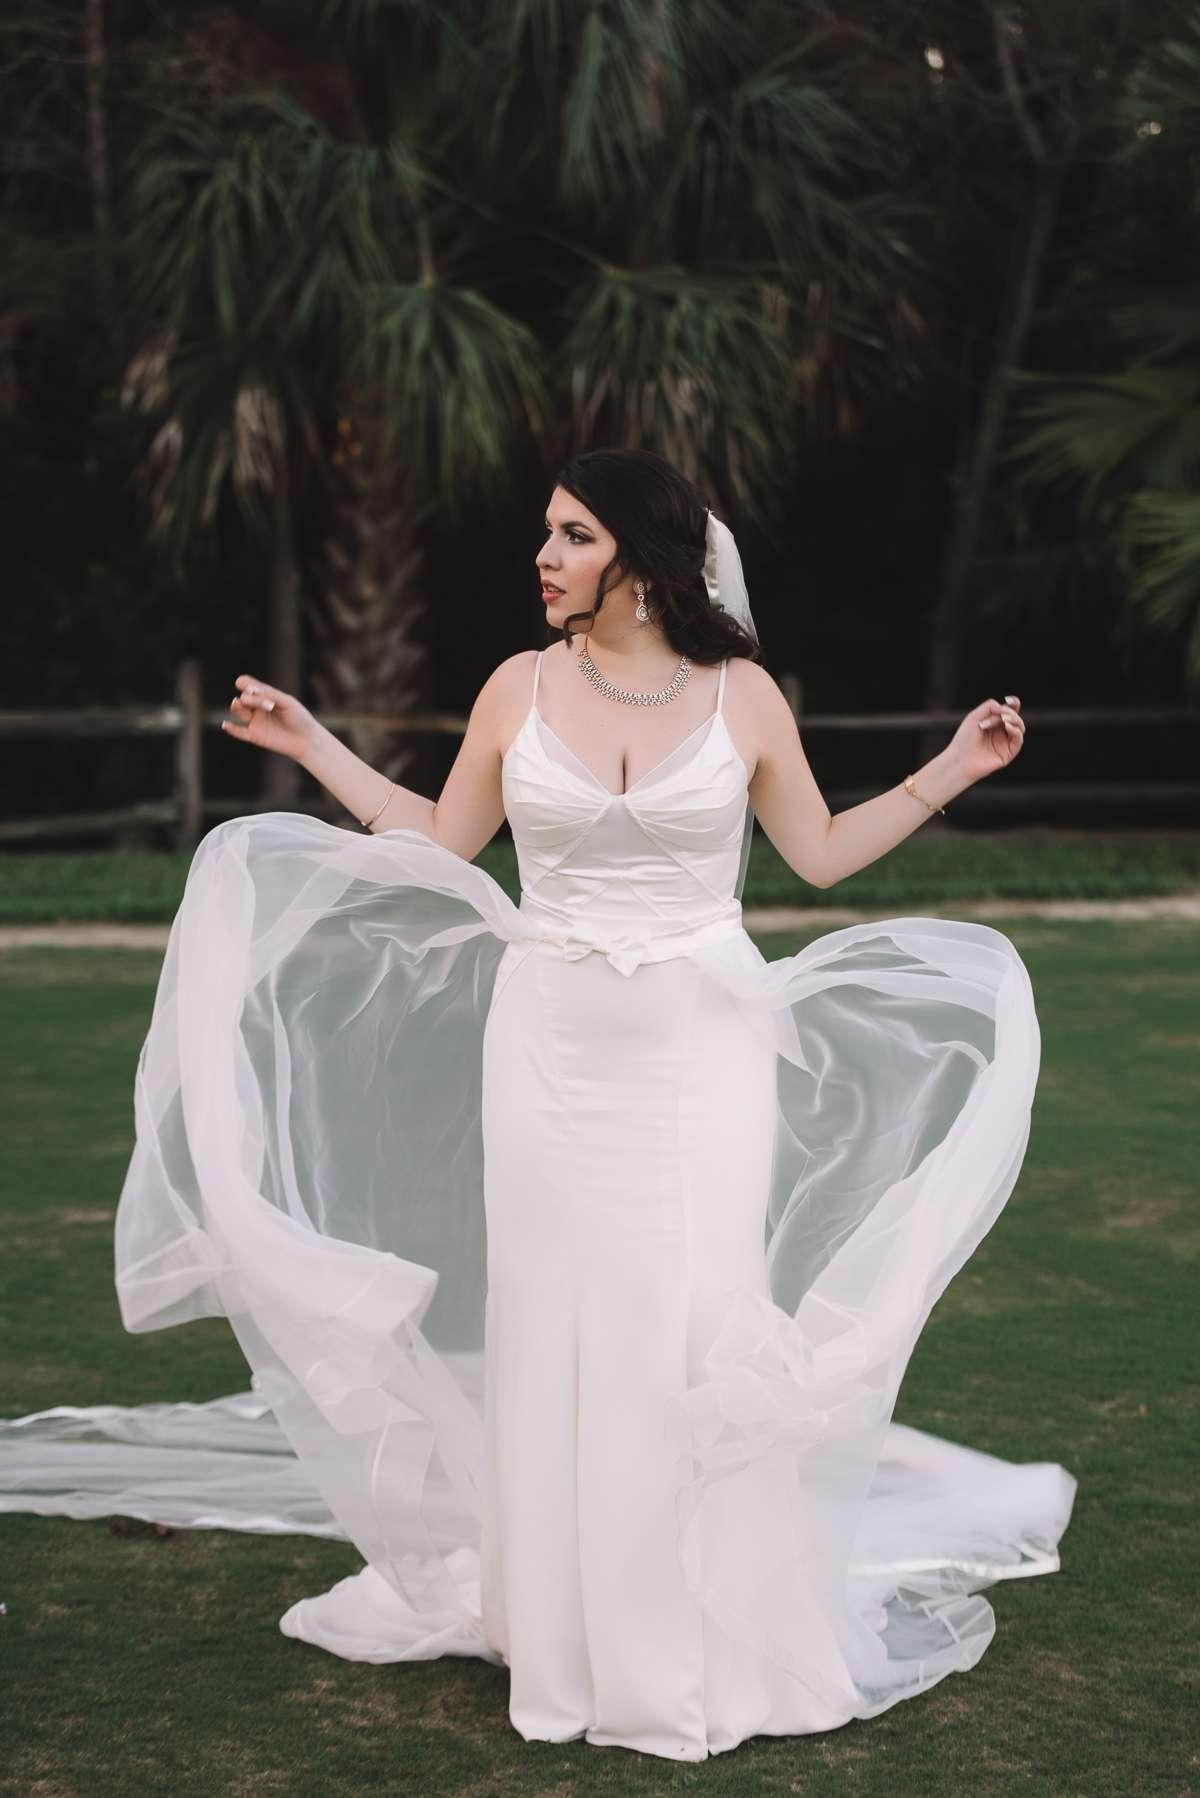 shannongray-ivanadanny-wedding-61